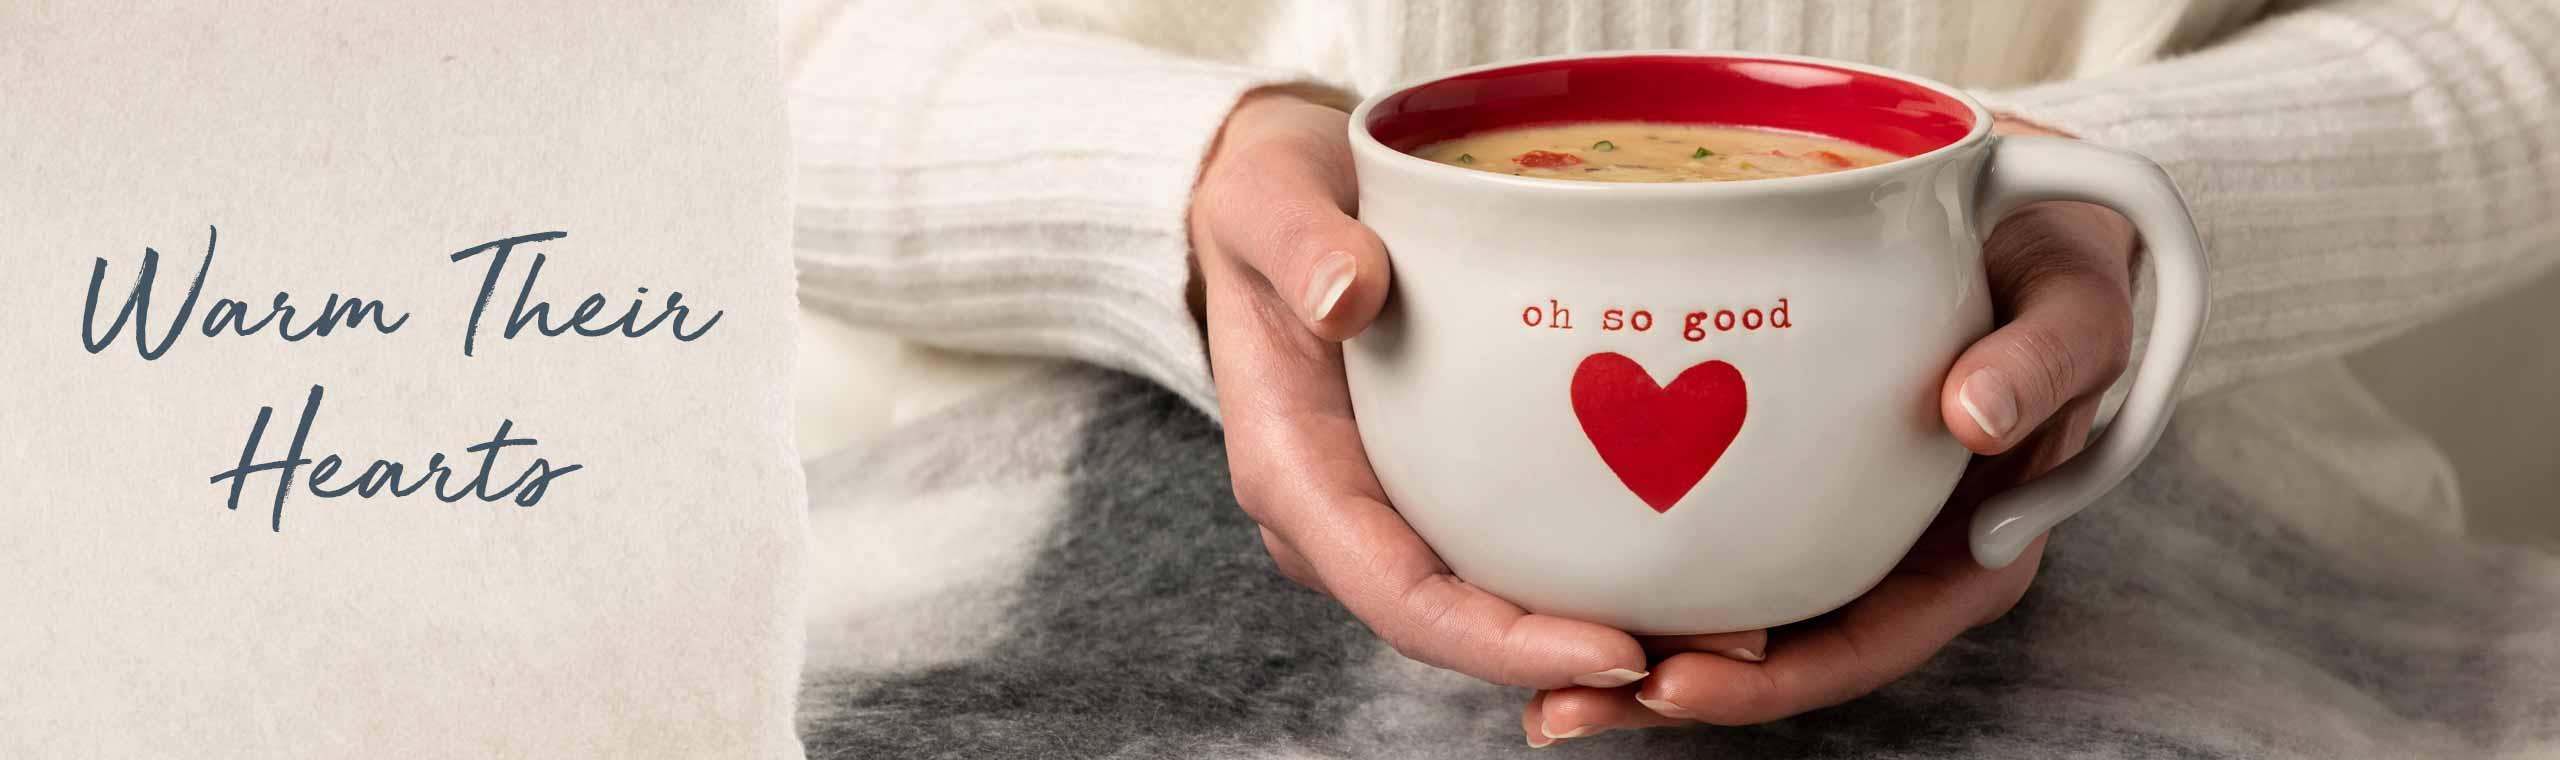 Warm their hearts! a black mug with grandpa writen